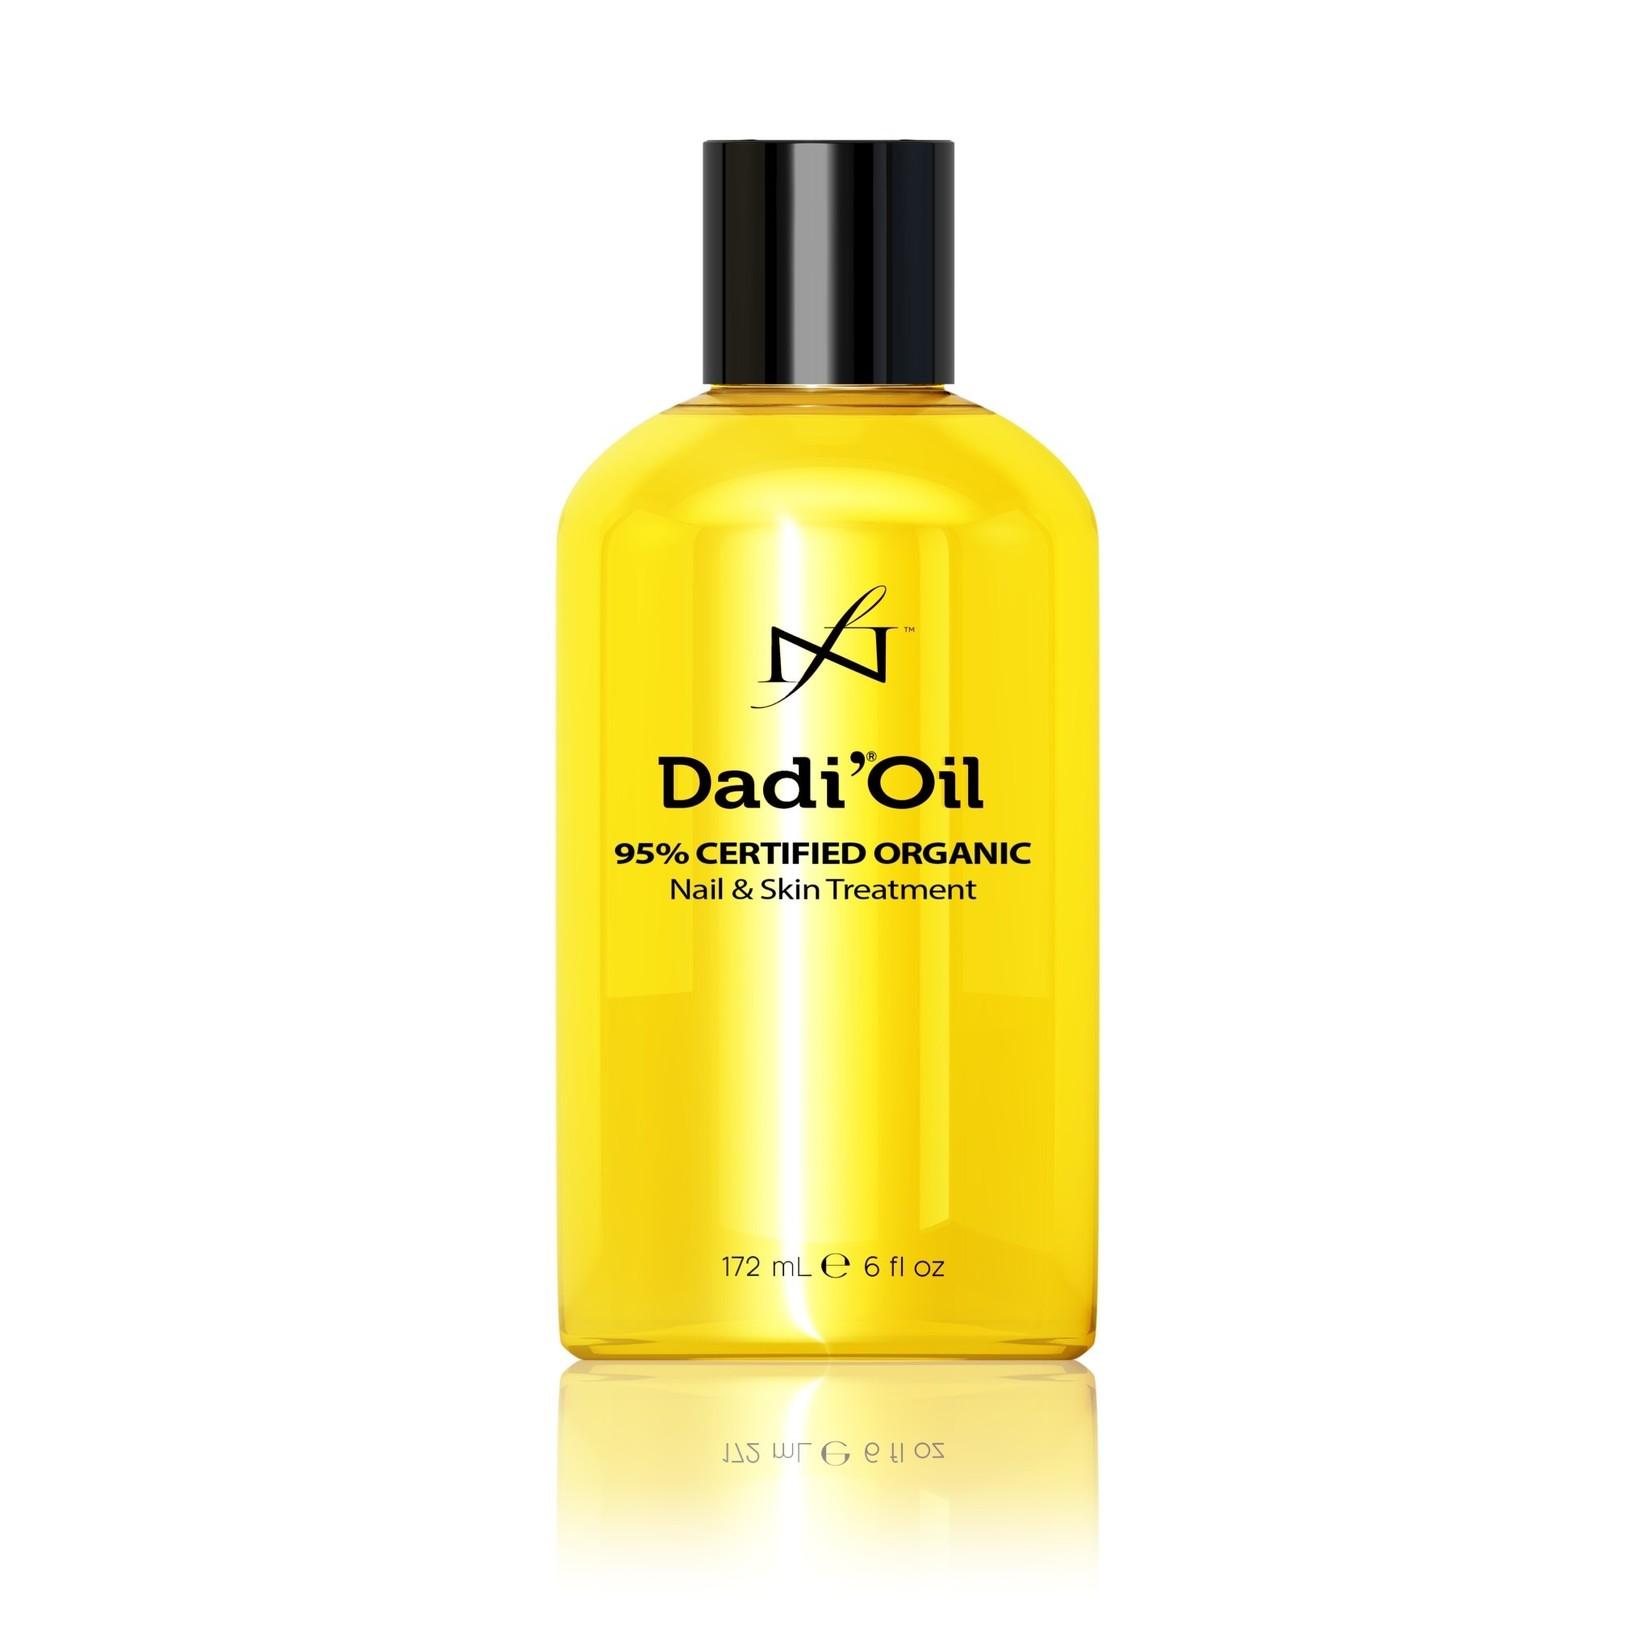 Dadi'Oil Dadi'Oil fles 172ml